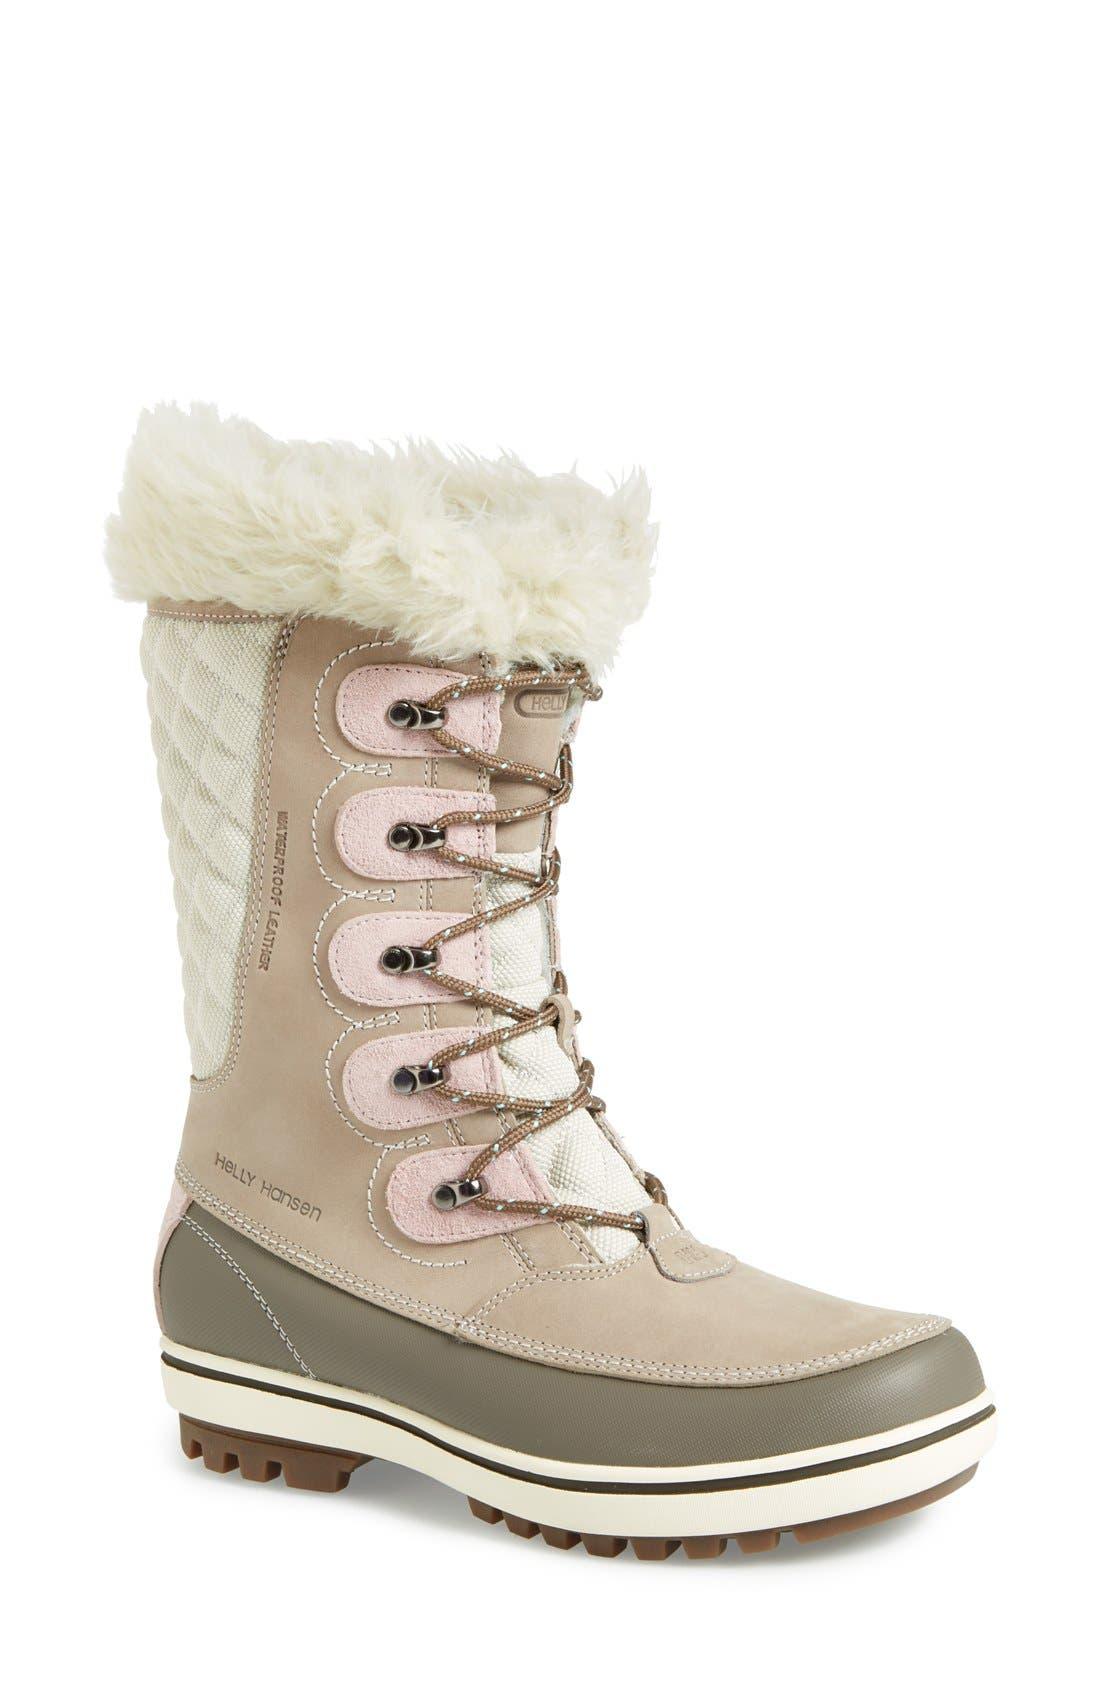 Main Image - Helly Hansen 'Garibaldi' Waterproof Snow Boot (Women)